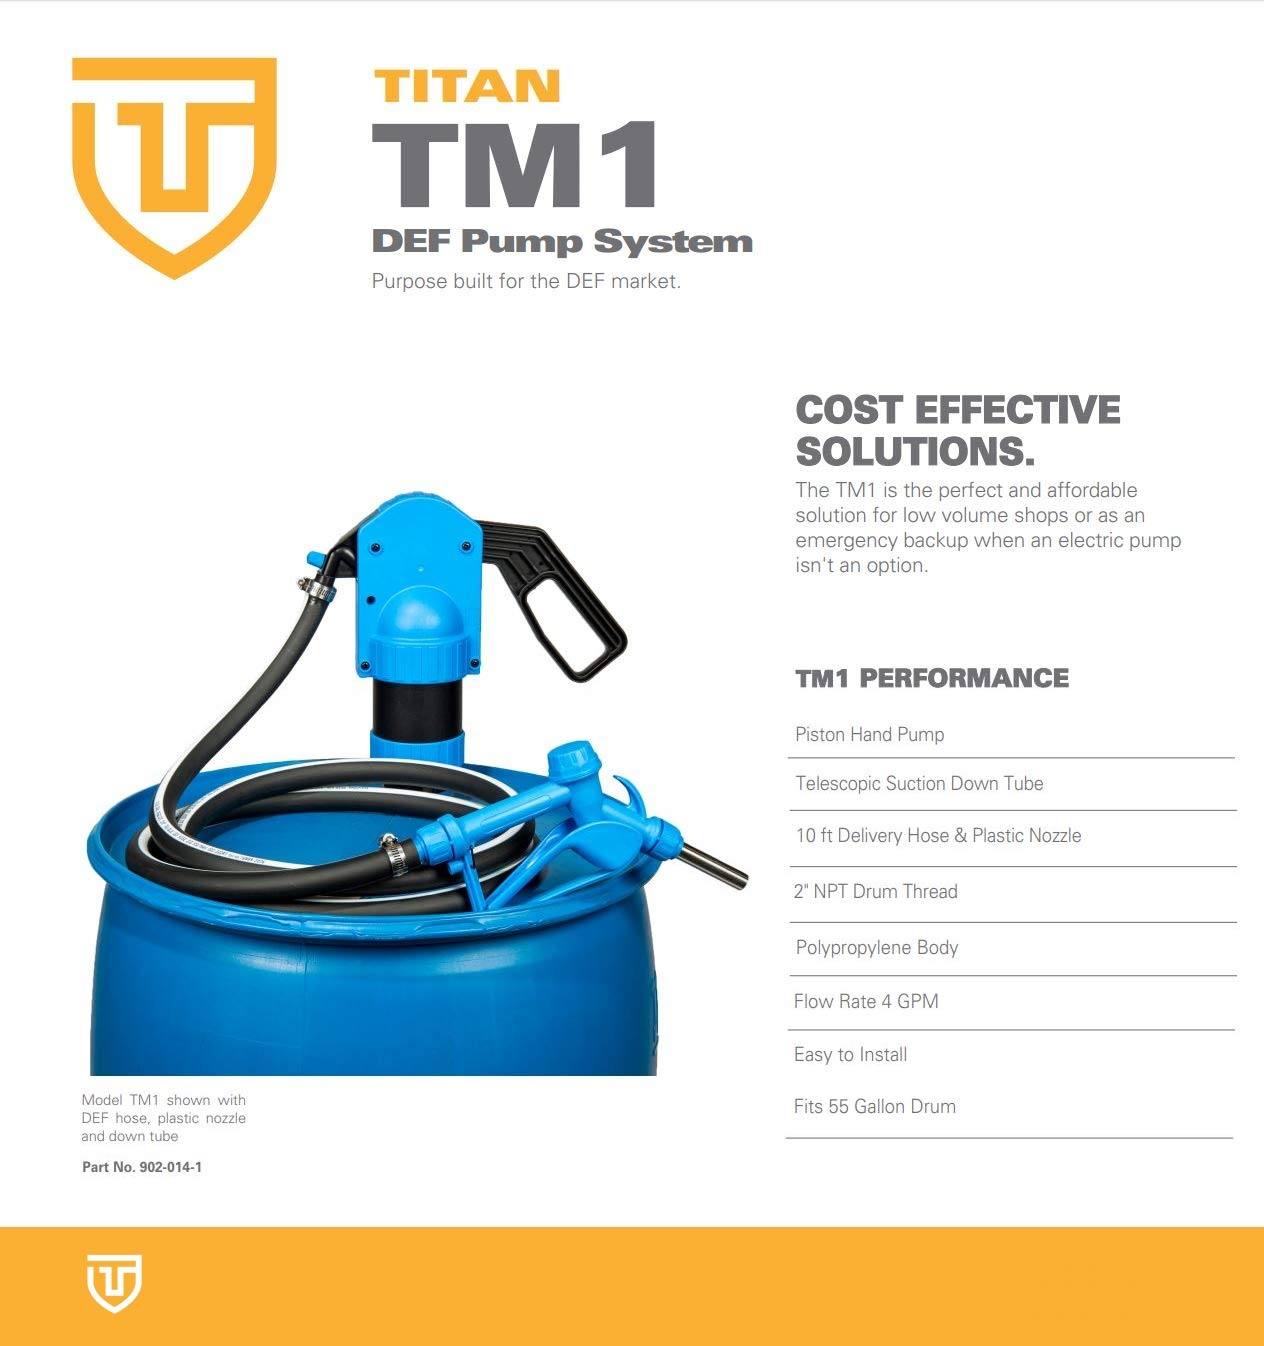 Titan 902-014-1 TCT TM1 Manual Pump with Hose and Nozzle, Plastic by Titan (Image #2)